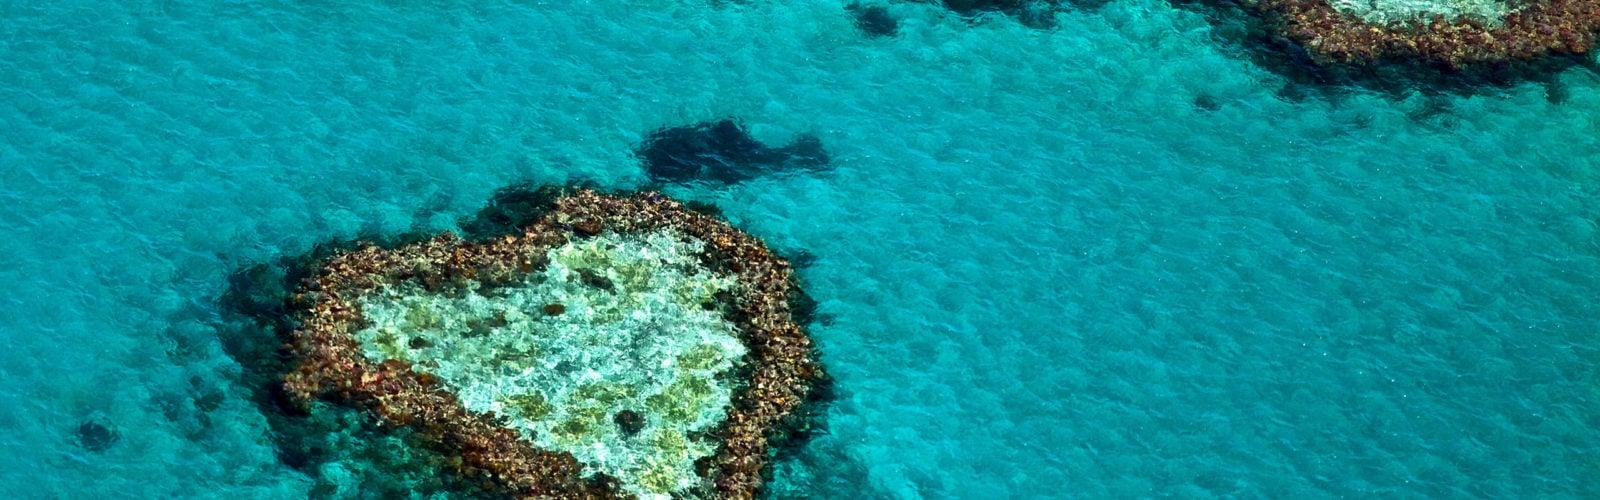 heart-reef-great-barrier-reef-whitsundays-australia